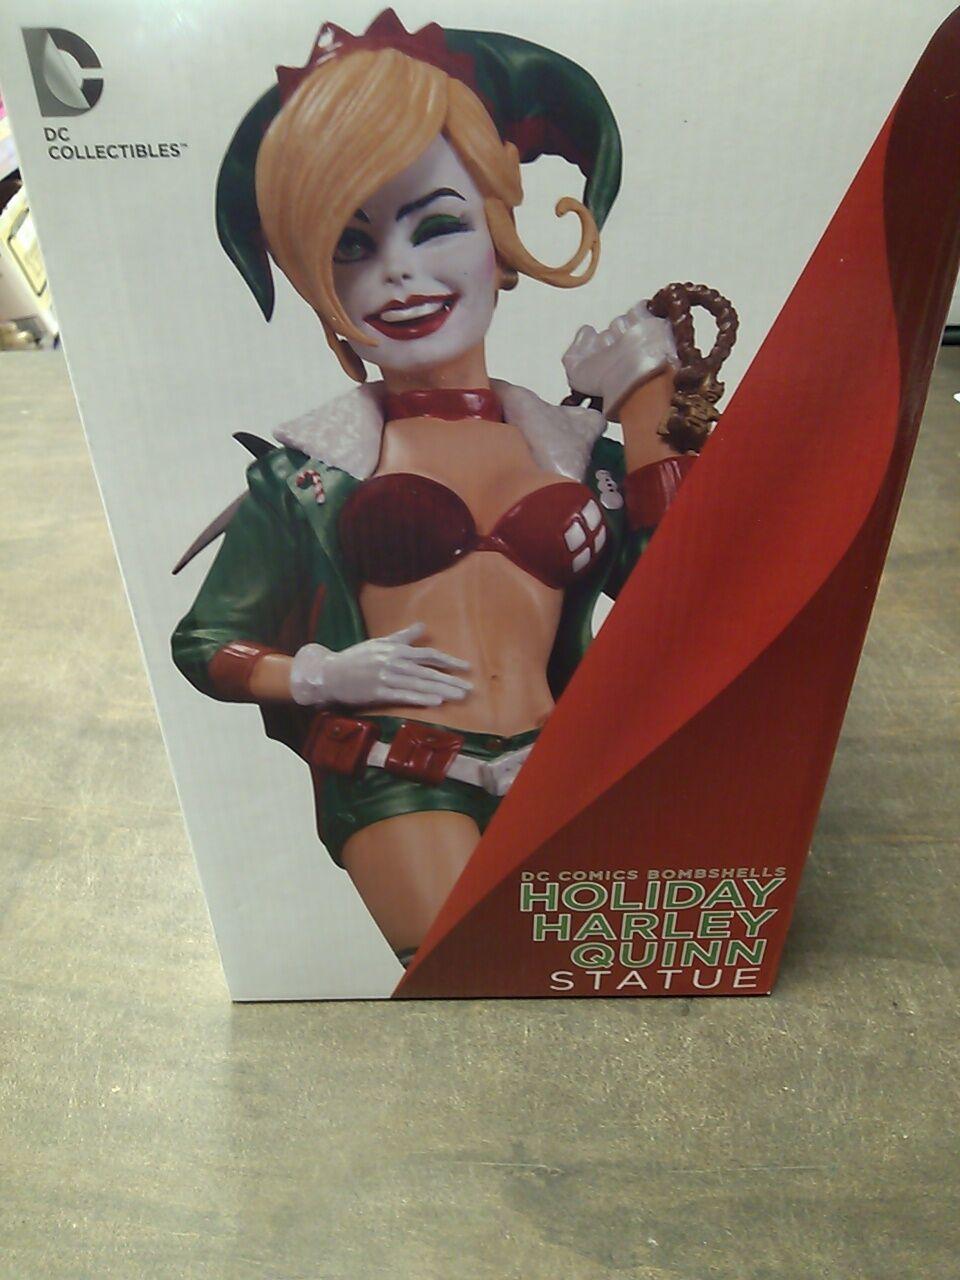 Dc comics sexbombe statue urlaub harley quinn